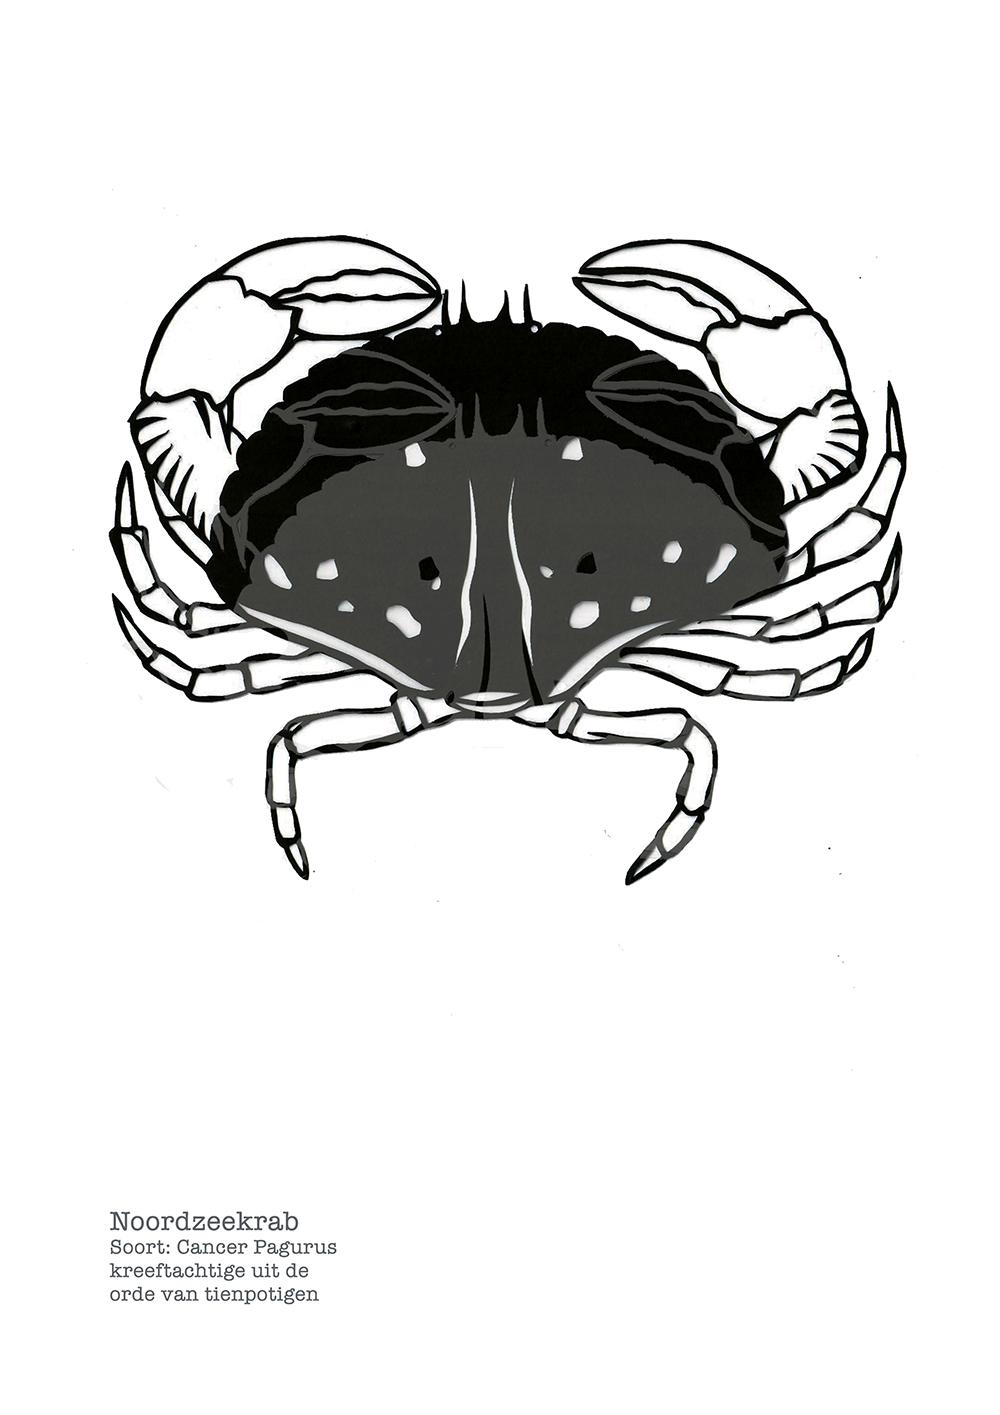 Studiocooliejoelie-karinmol-papiersnijkunst-noordzeekrab-krab